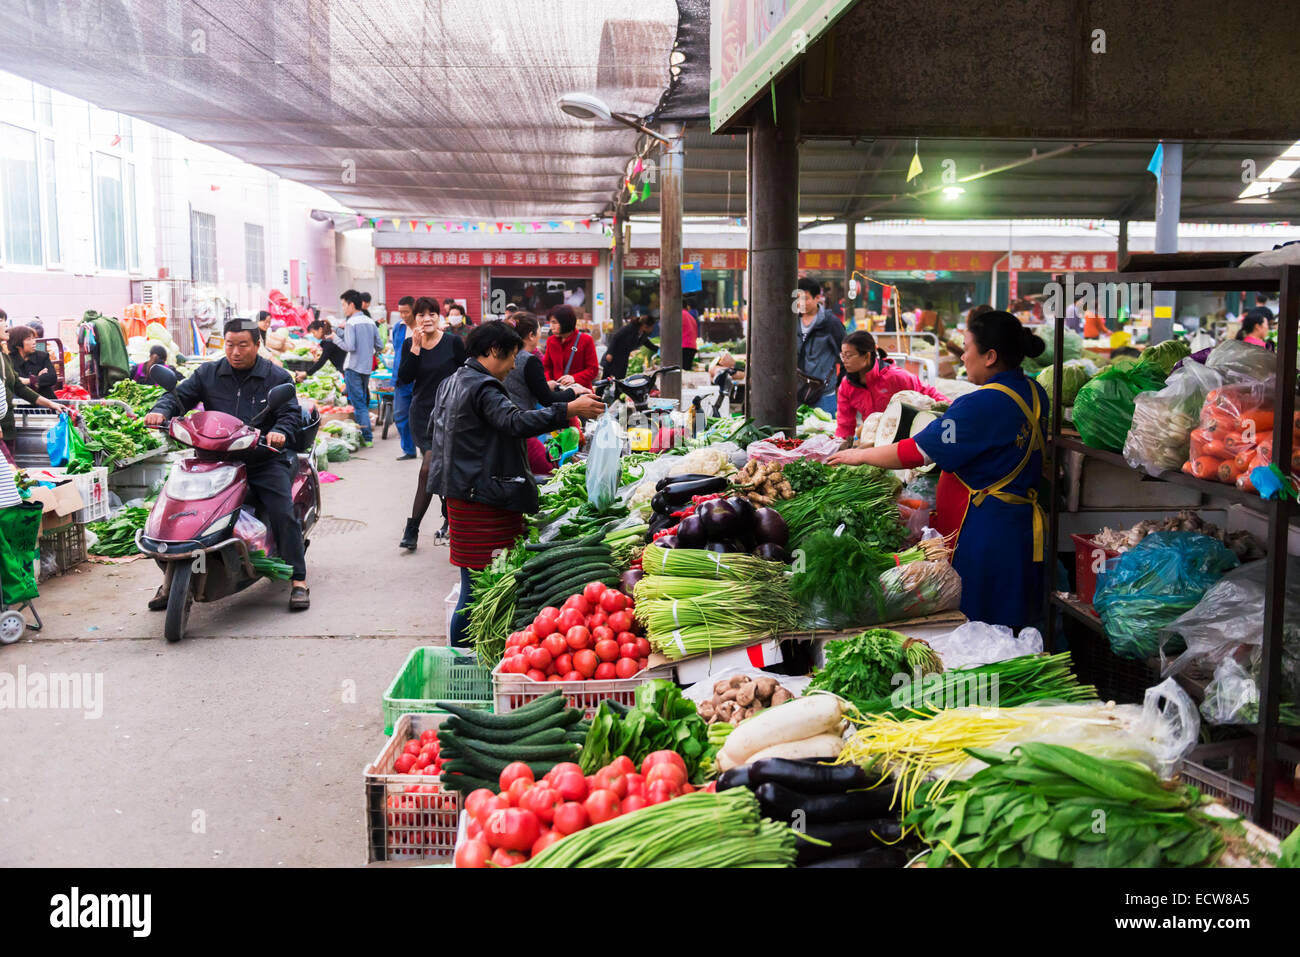 Whole foods market selling chinas produce